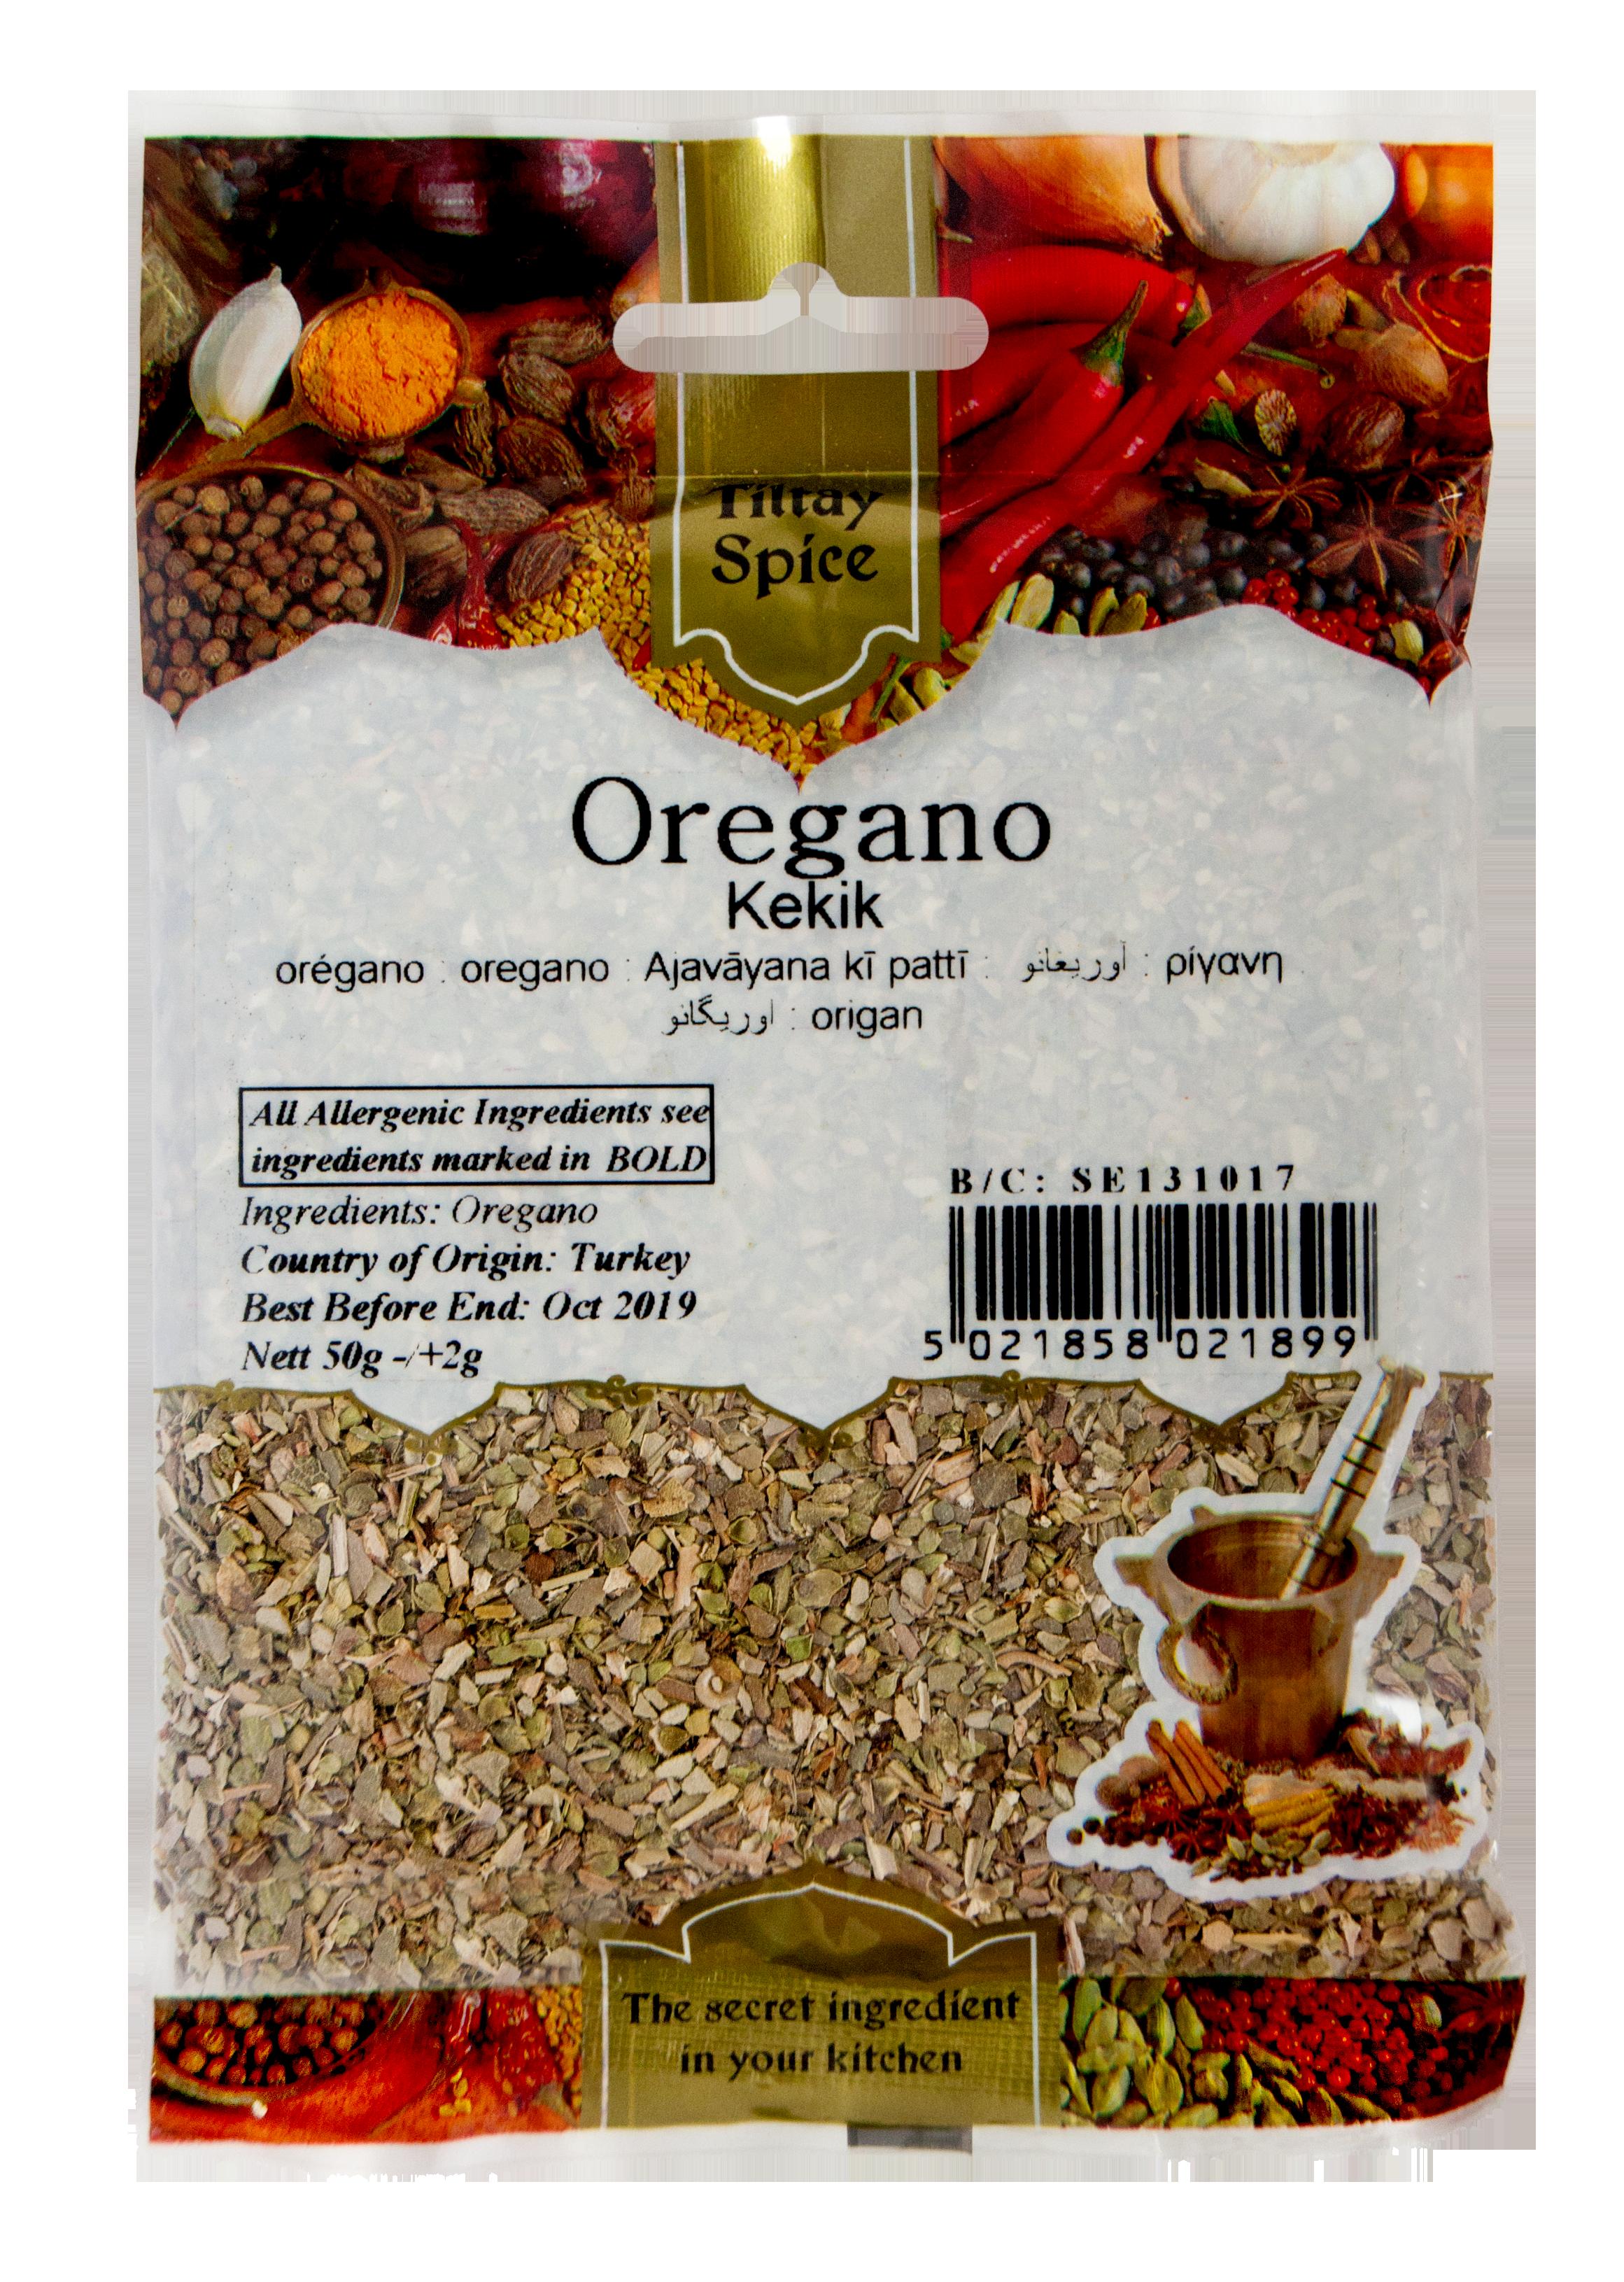 Tiltay Spice Oregano